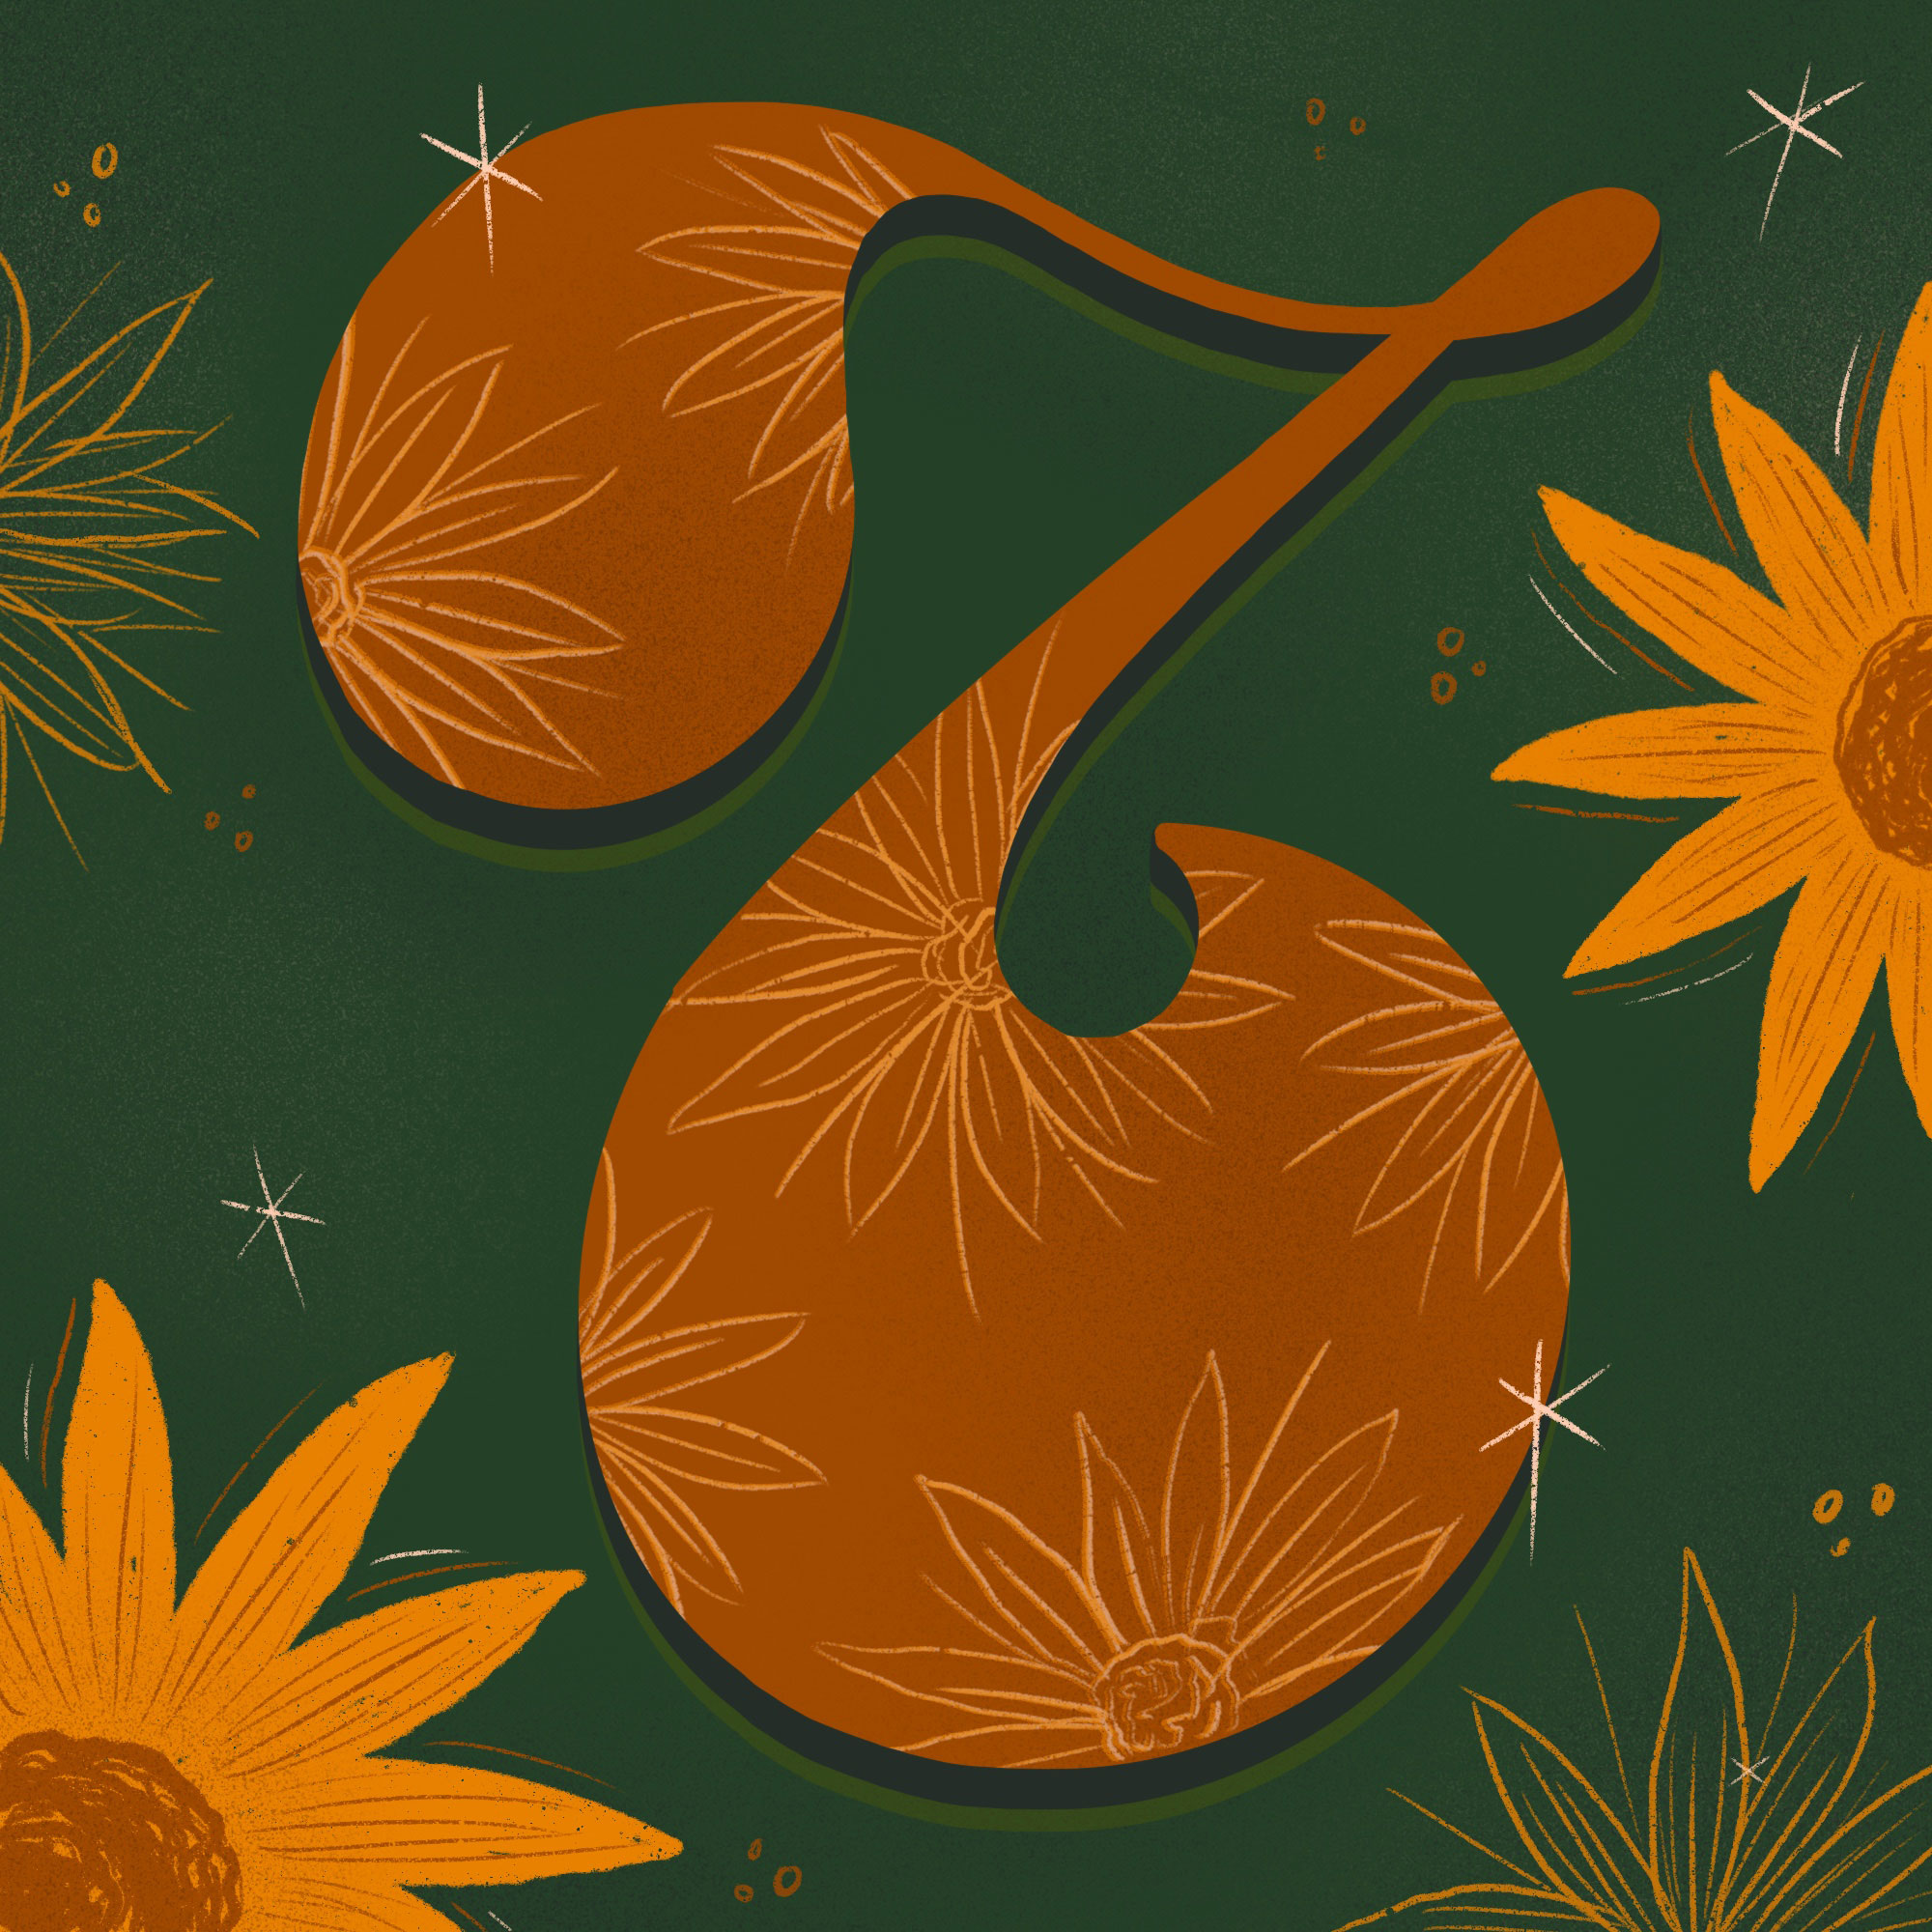 7 — Inula/Sunflower